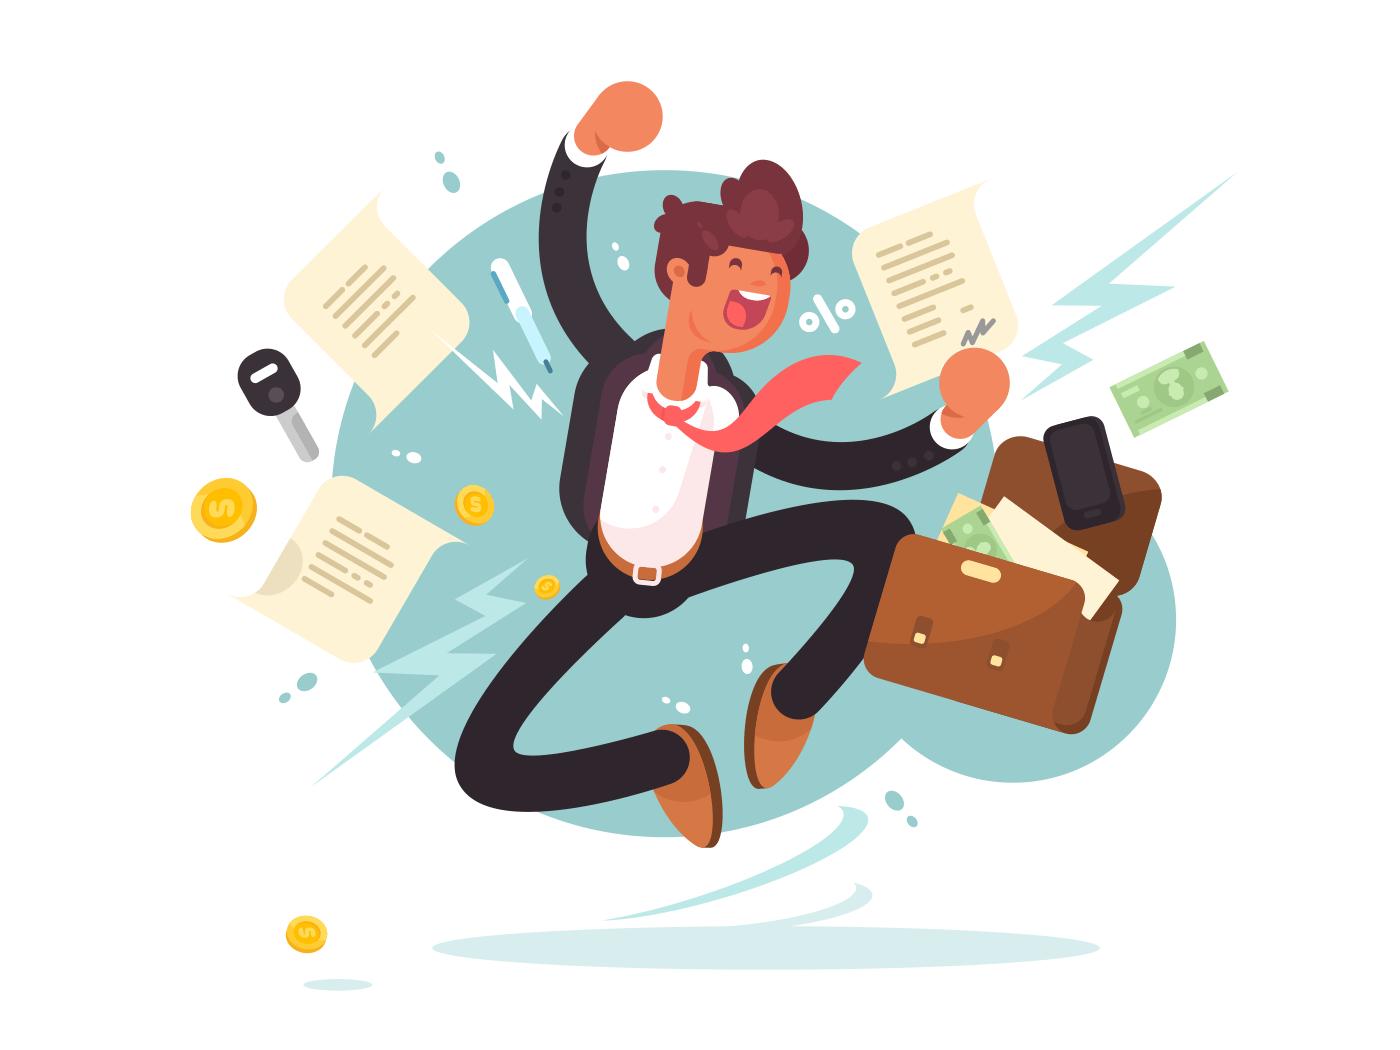 Successful businessman jumping illustration